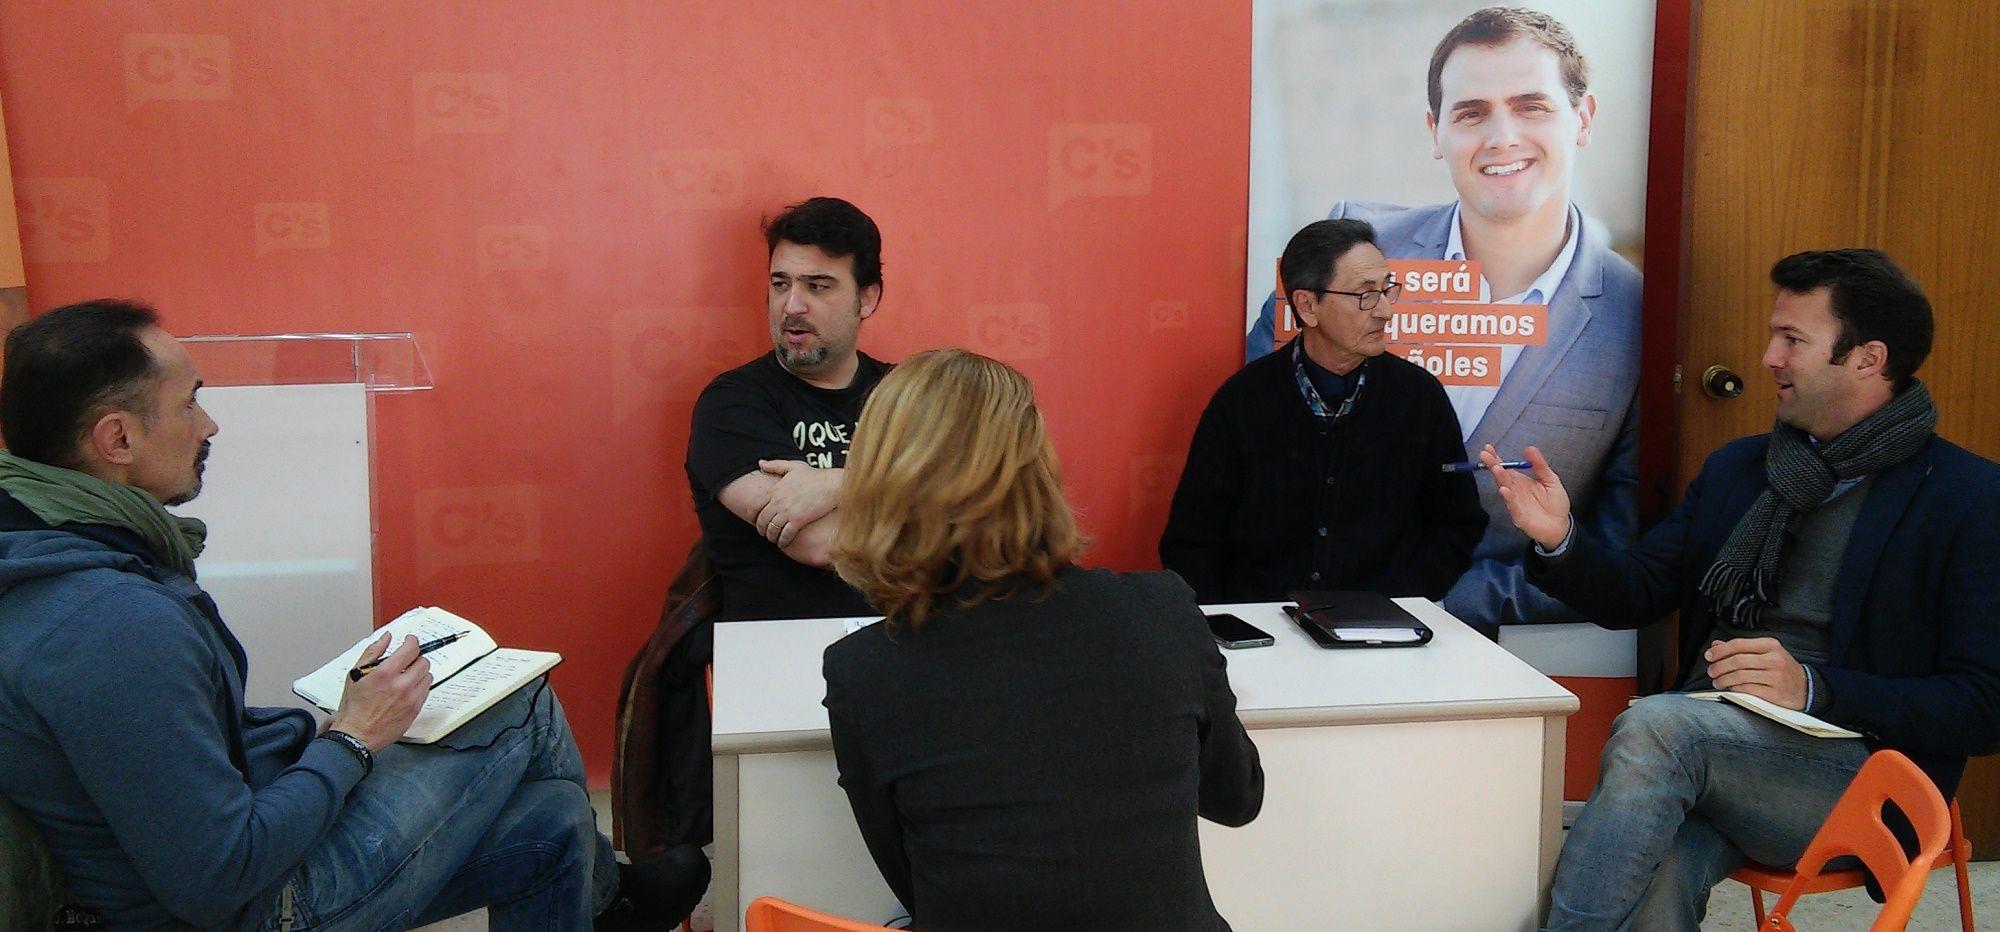 Ciudadanos Jerez - Moteros